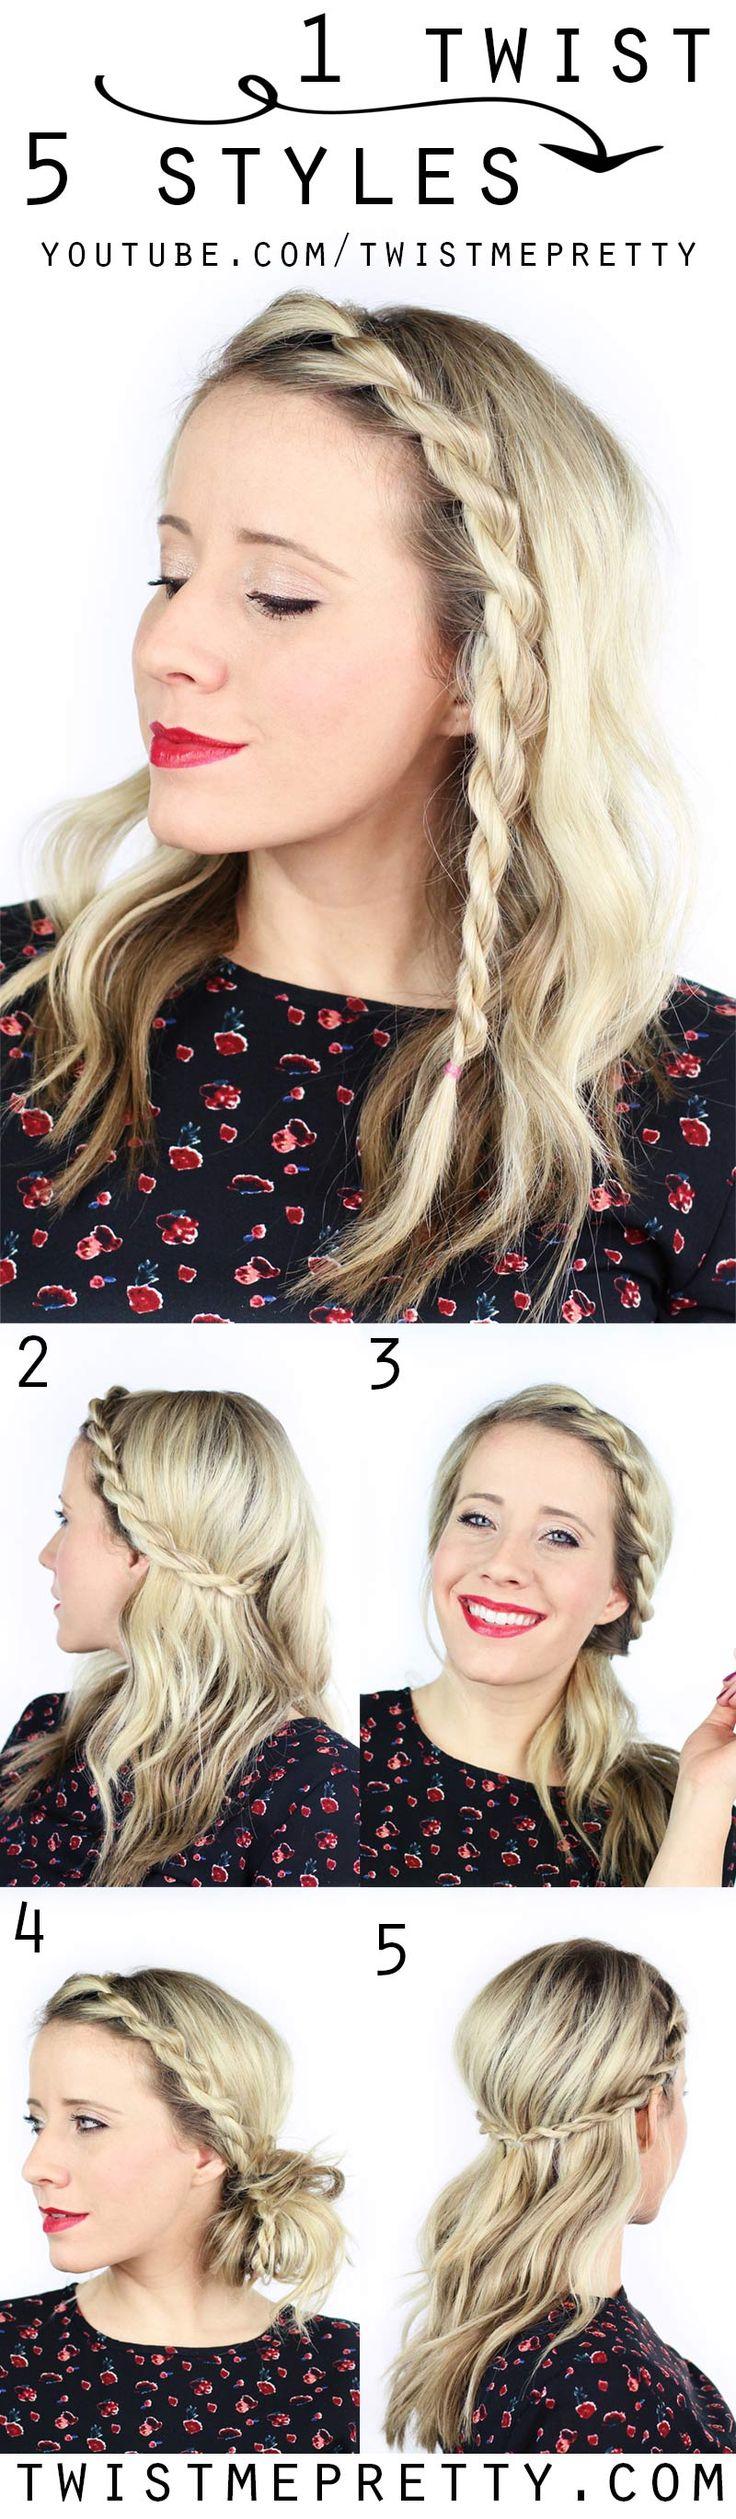 Best 25+ Twist hairstyles ideas on Pinterest | Simple hairstyles ...